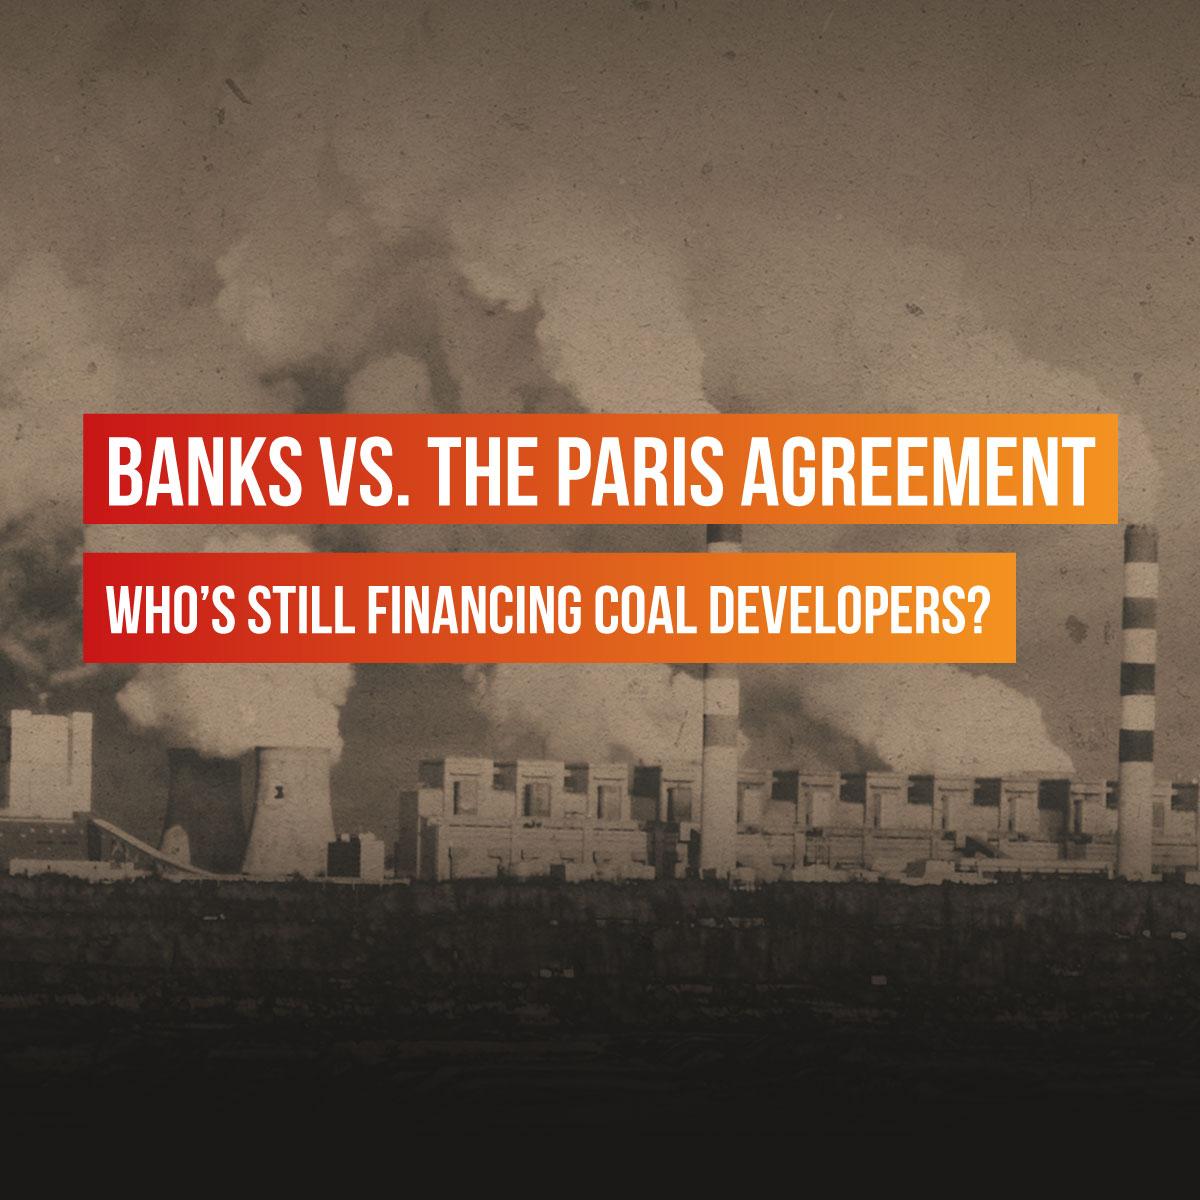 Banks vs. the Paris Agreement - Who is still financing coal plant development?